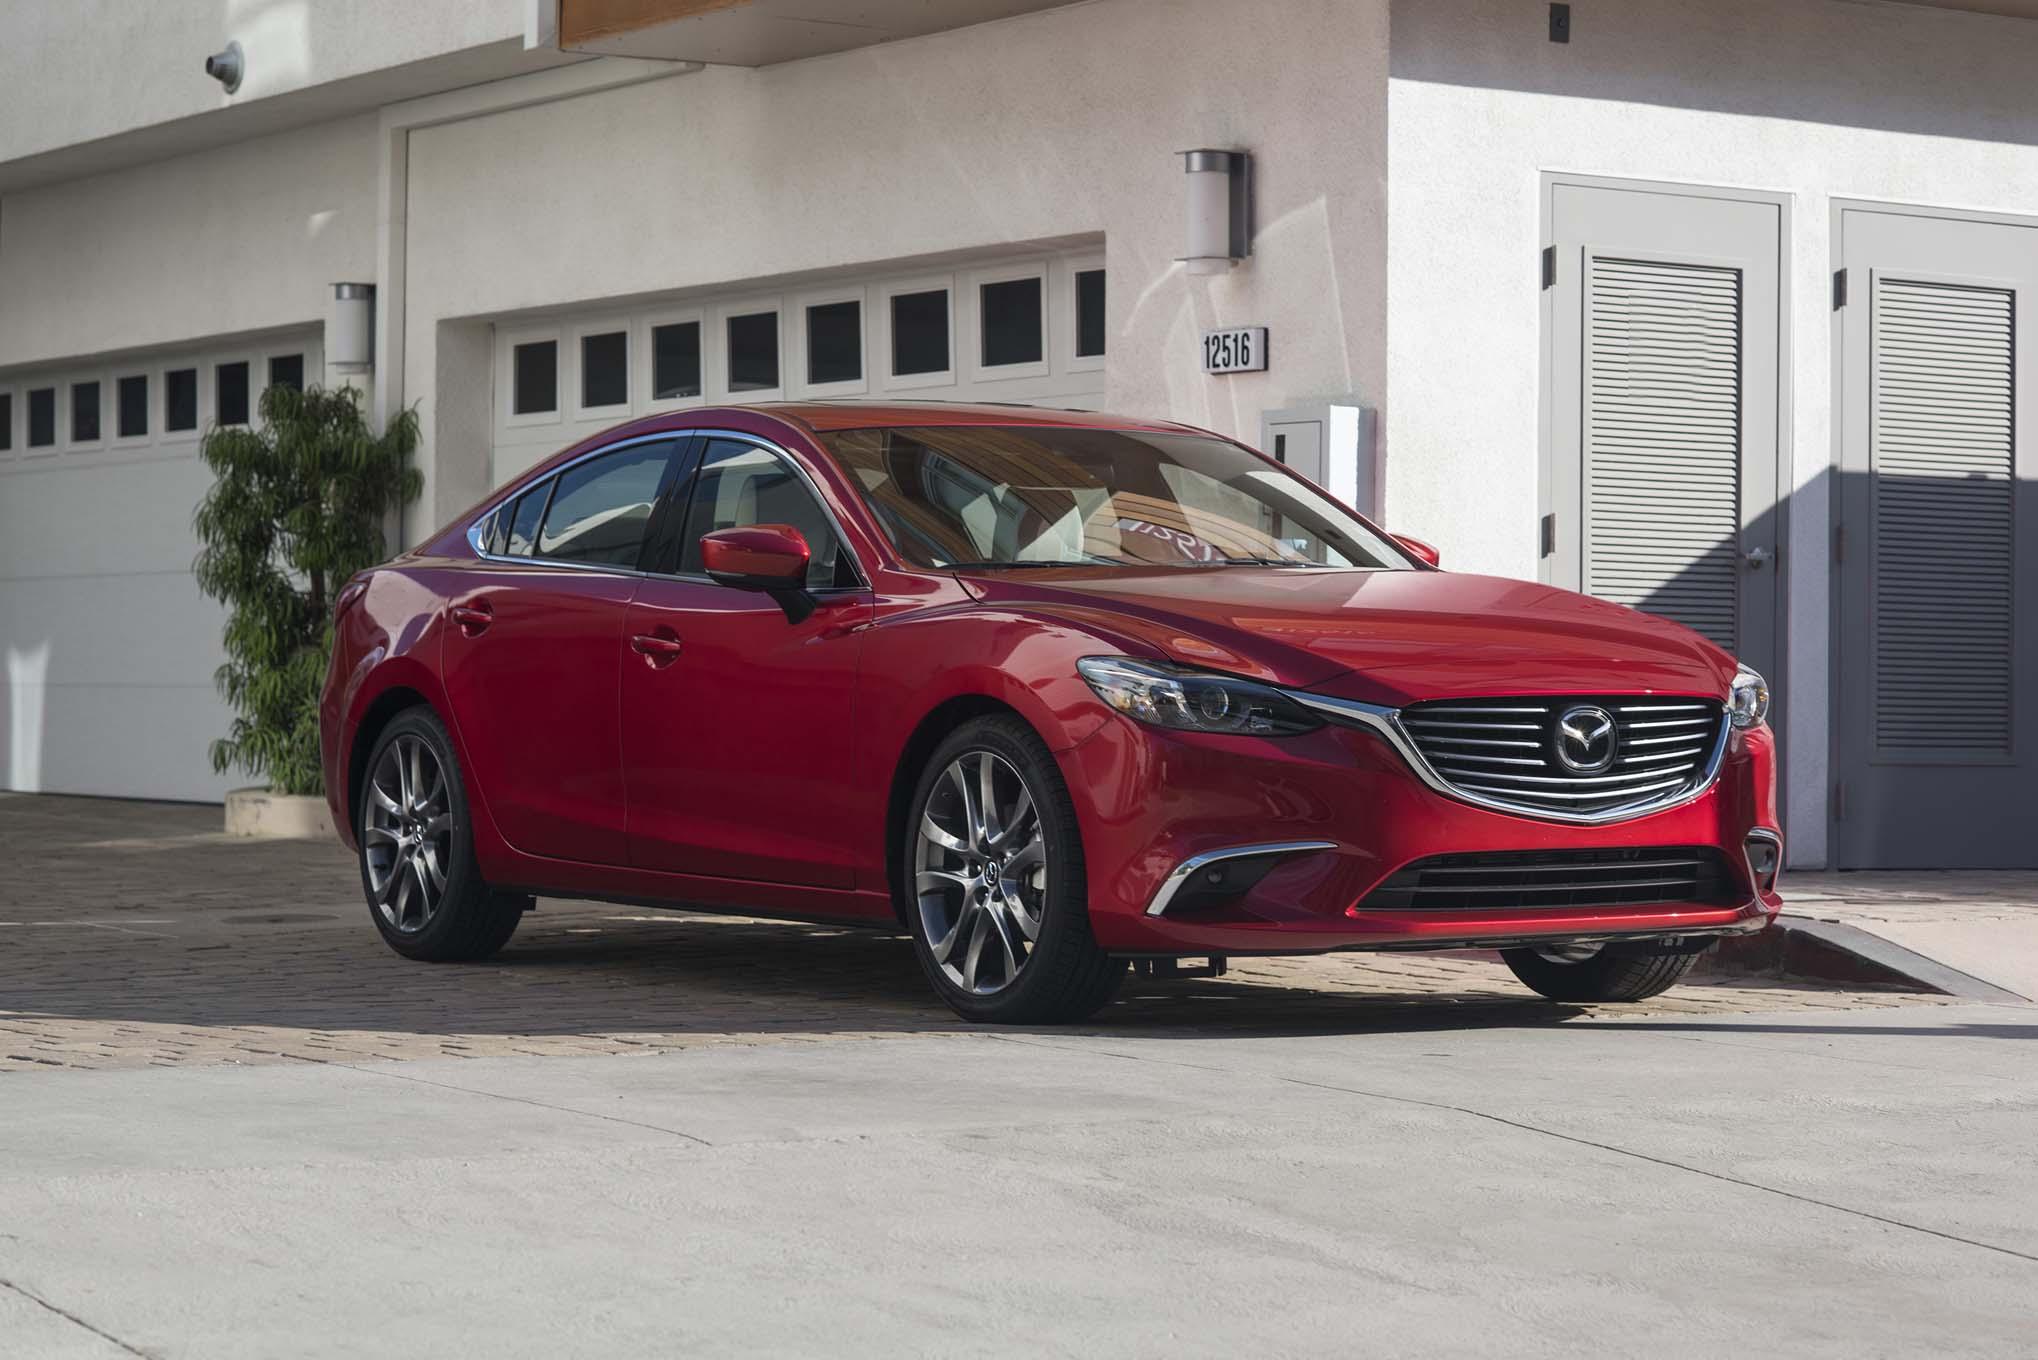 2017 Mazda6 Front Three Quarter 04